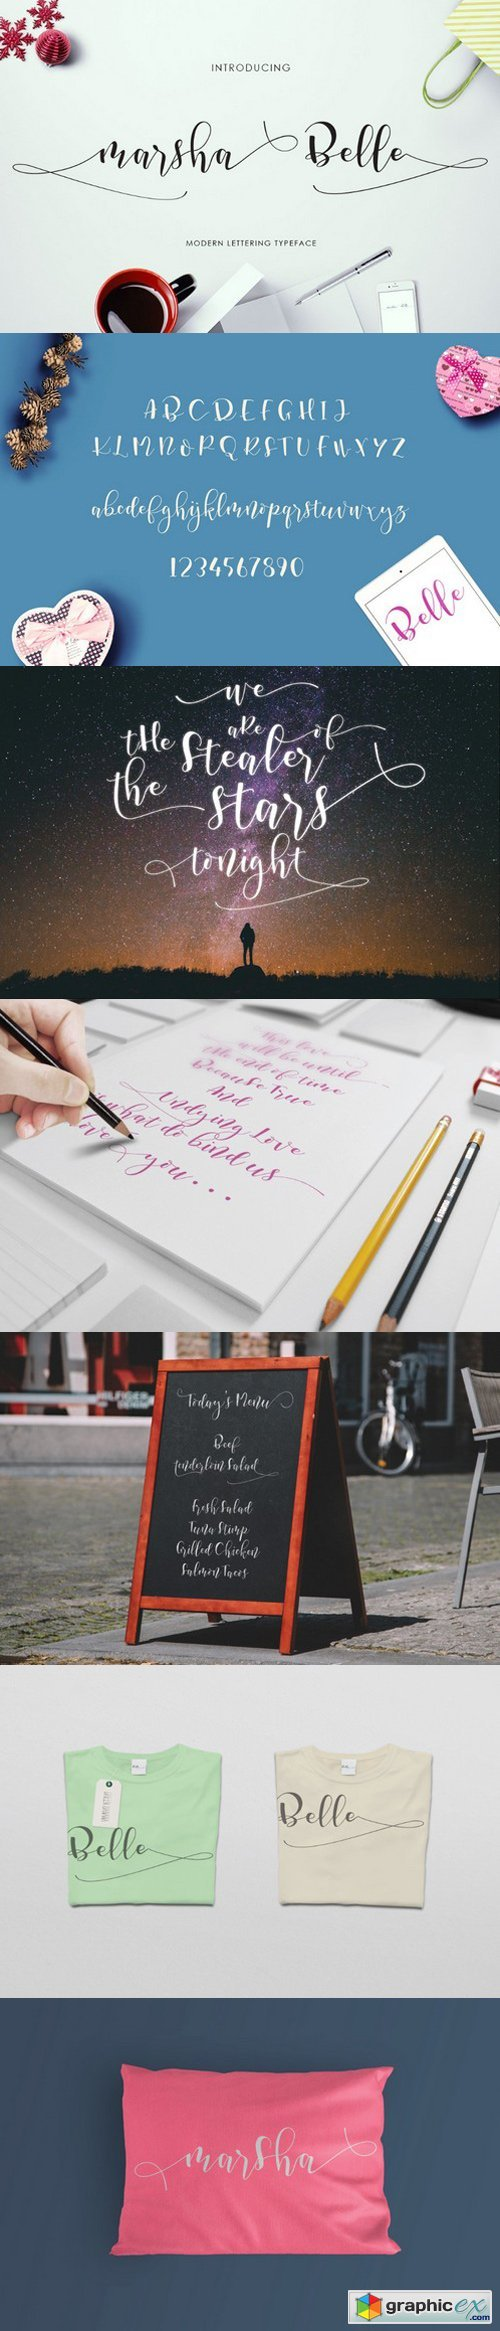 Marsha Belle Script Font » Free Download Vector Stock Image